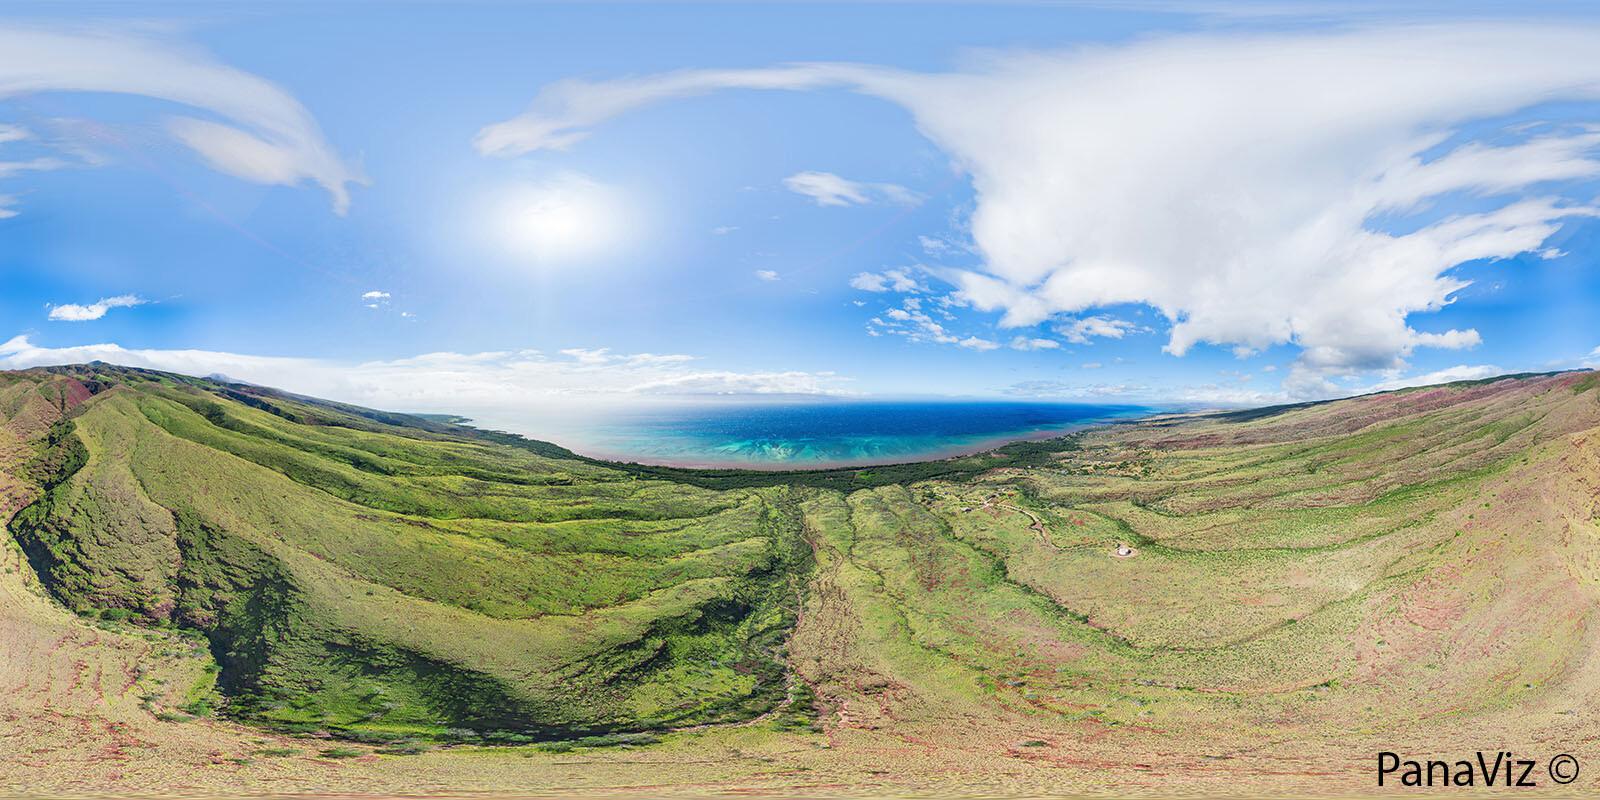 https://panaviz.com/scenic-molokai/south-molokai/